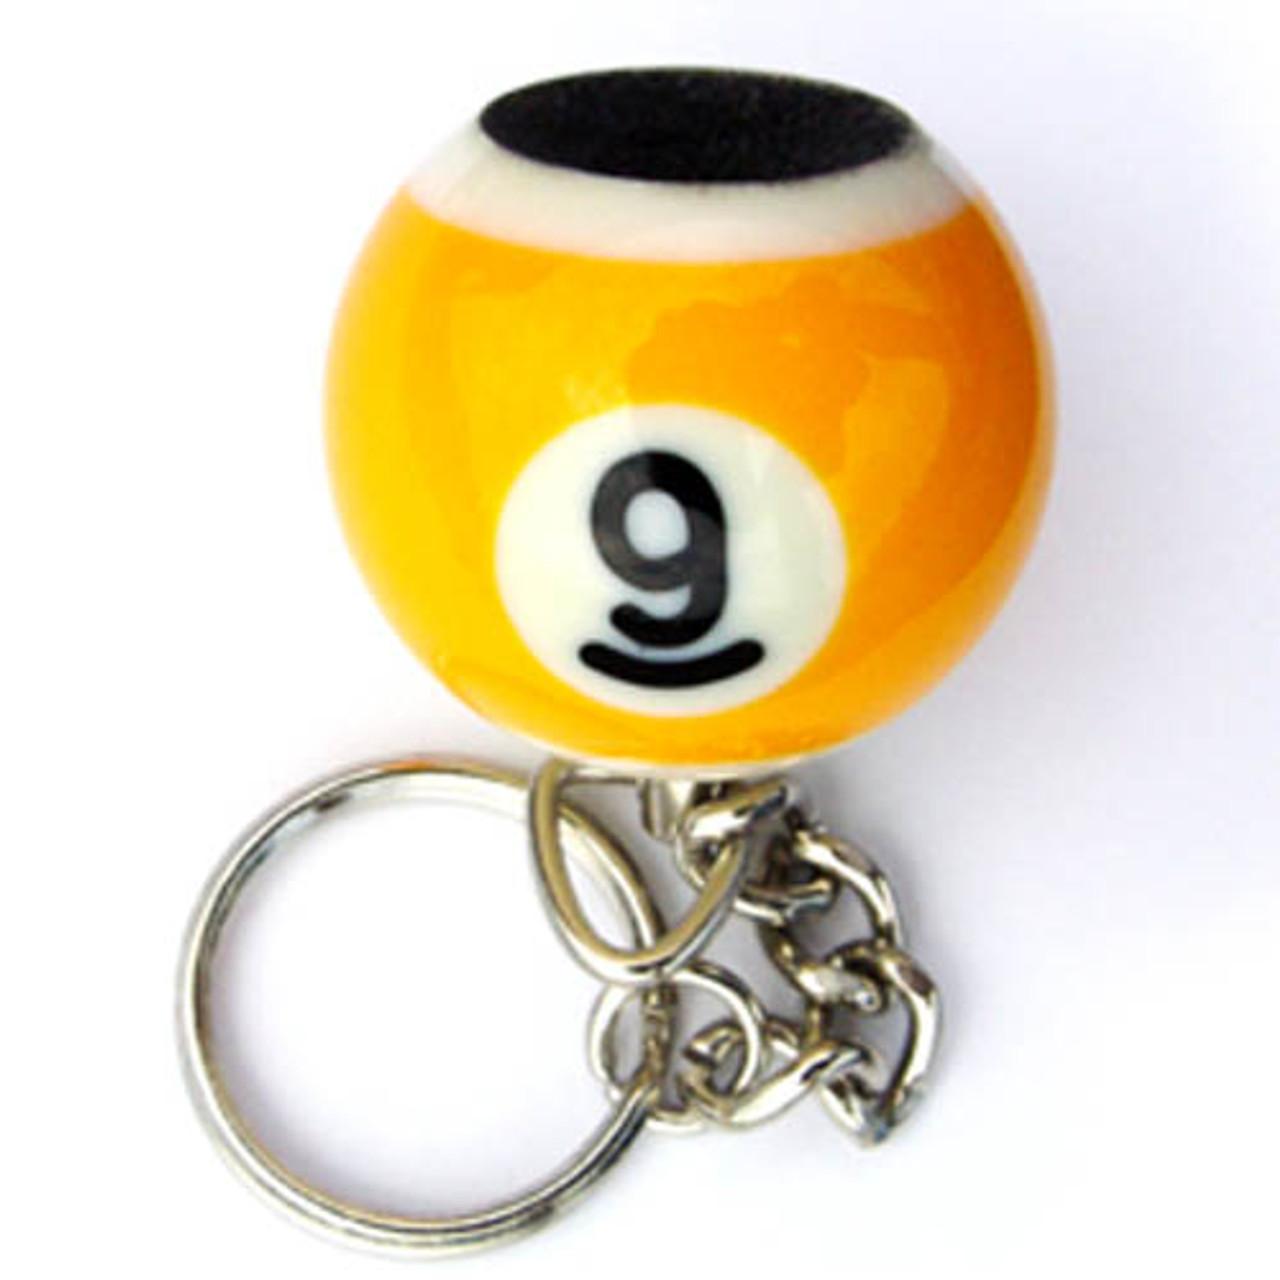 Pool Ball Key Chain and Scuffer, 9-Ball